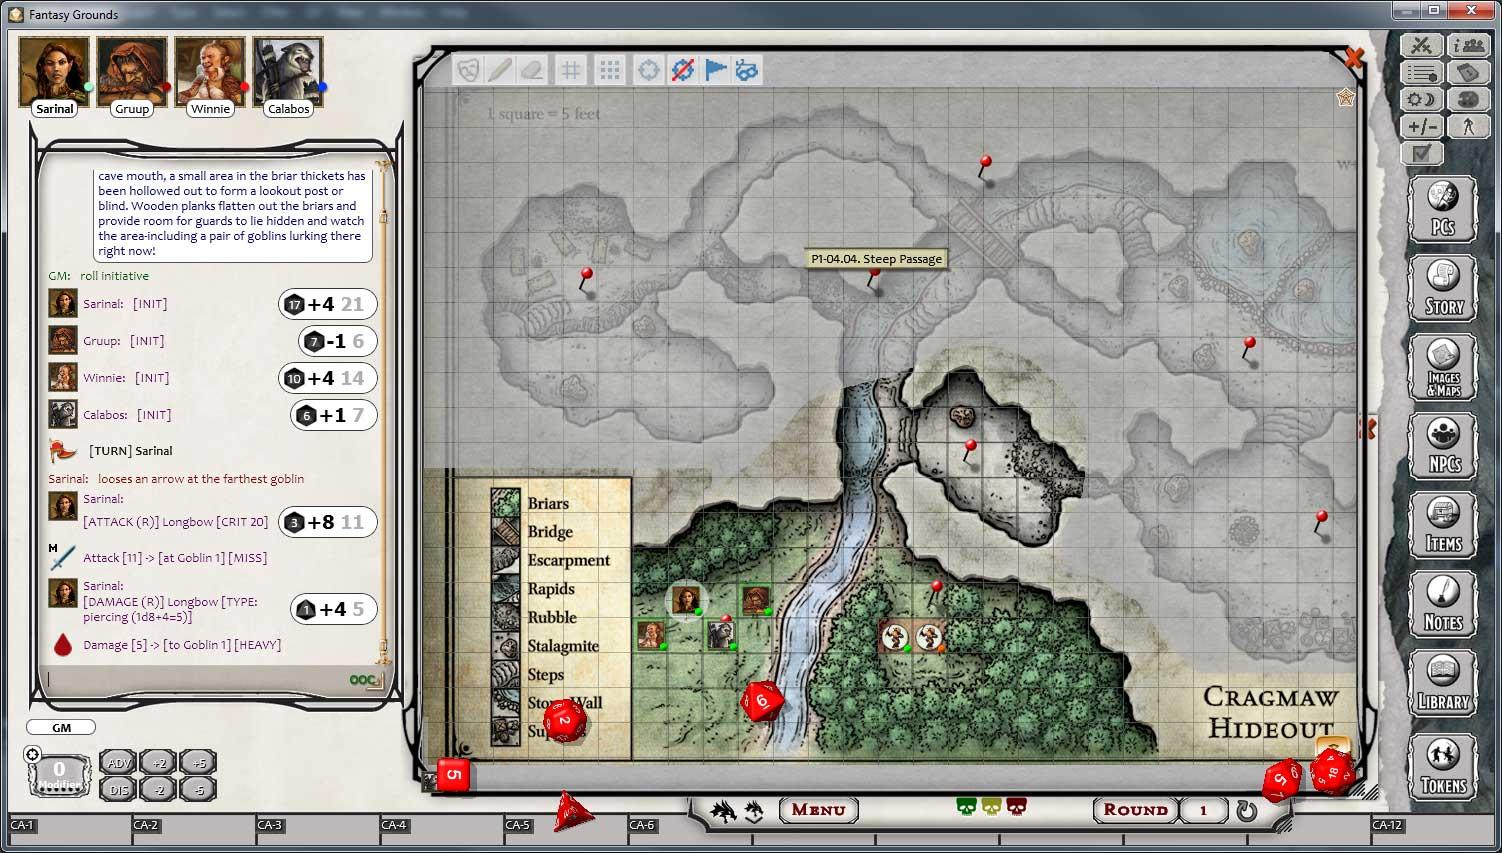 Fantasy Grounds - D&D Lost Mine of Phandelver on ye olde map maker, star wars miniatures map maker, dungeons dragons map generator, world of warcraft map maker, dungeons dragons campaign map, settlers of catan map maker, dnd map maker, dungeons & dragons world maps, d d maps maker, and d map maker,